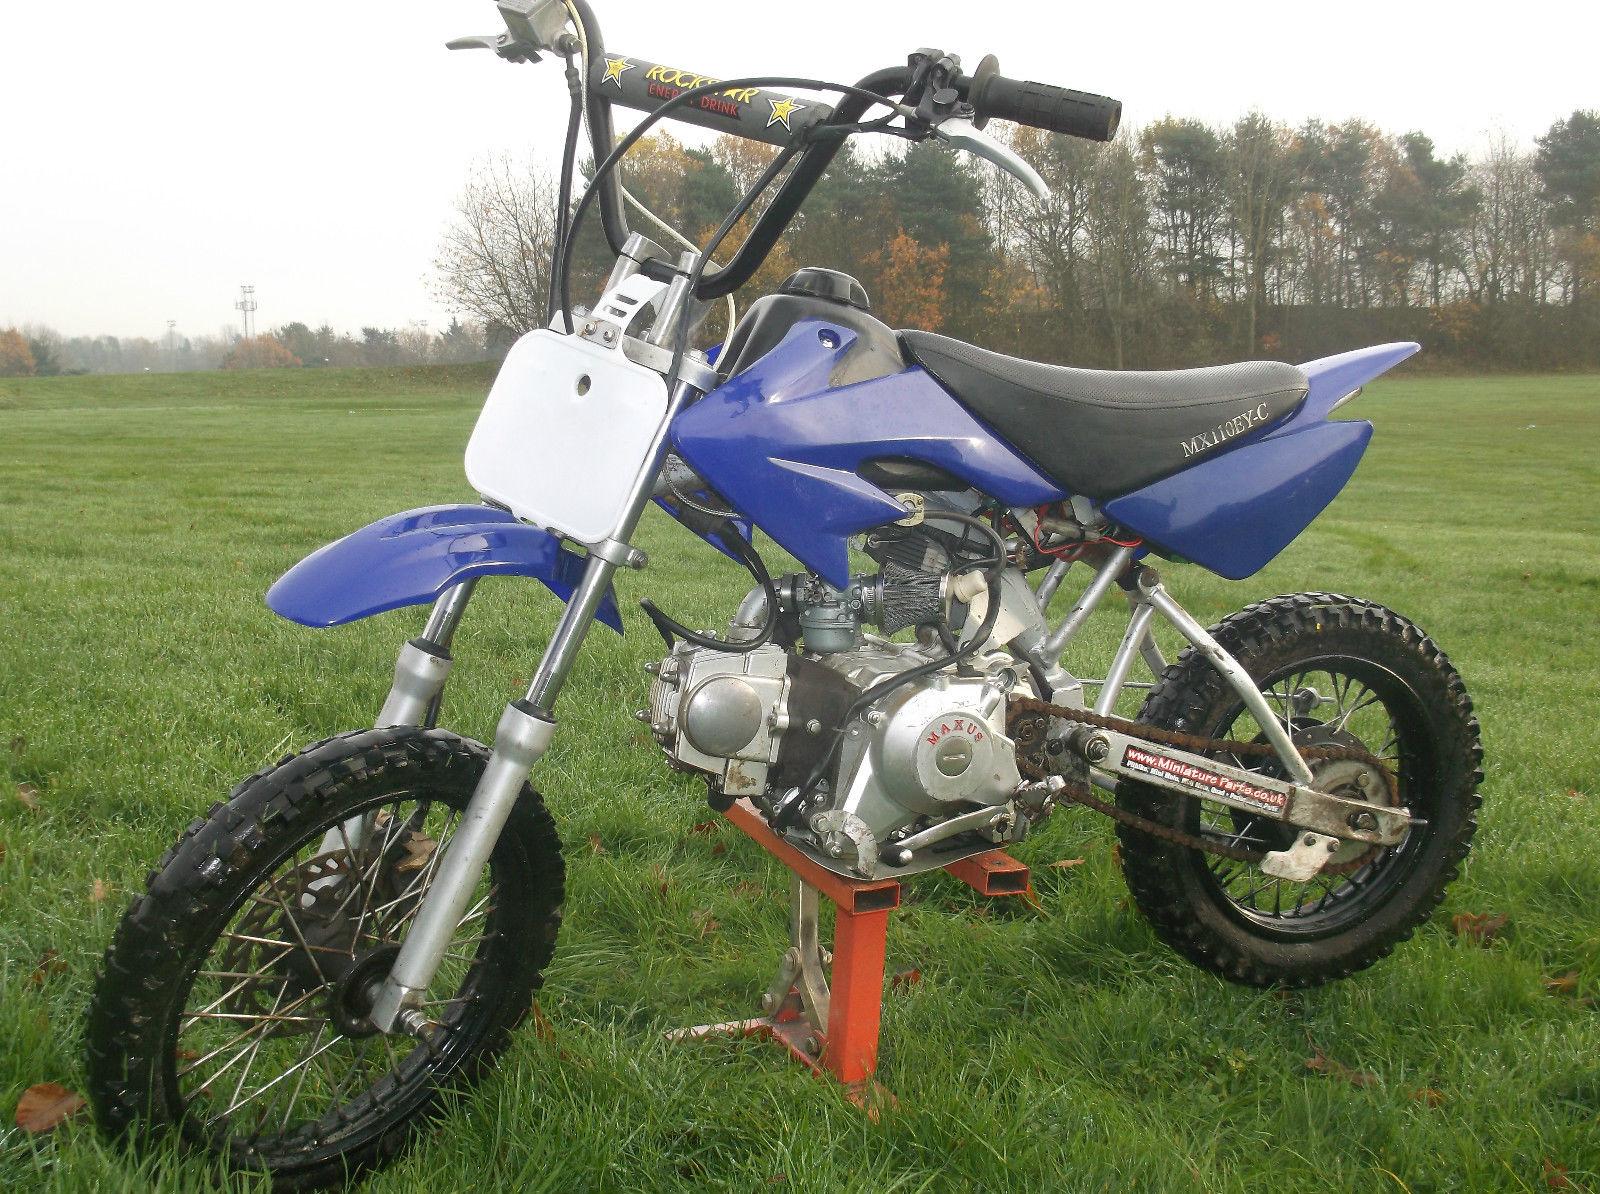 pit bike 110 cc field bike dirt motorcross kids motorbike. Black Bedroom Furniture Sets. Home Design Ideas